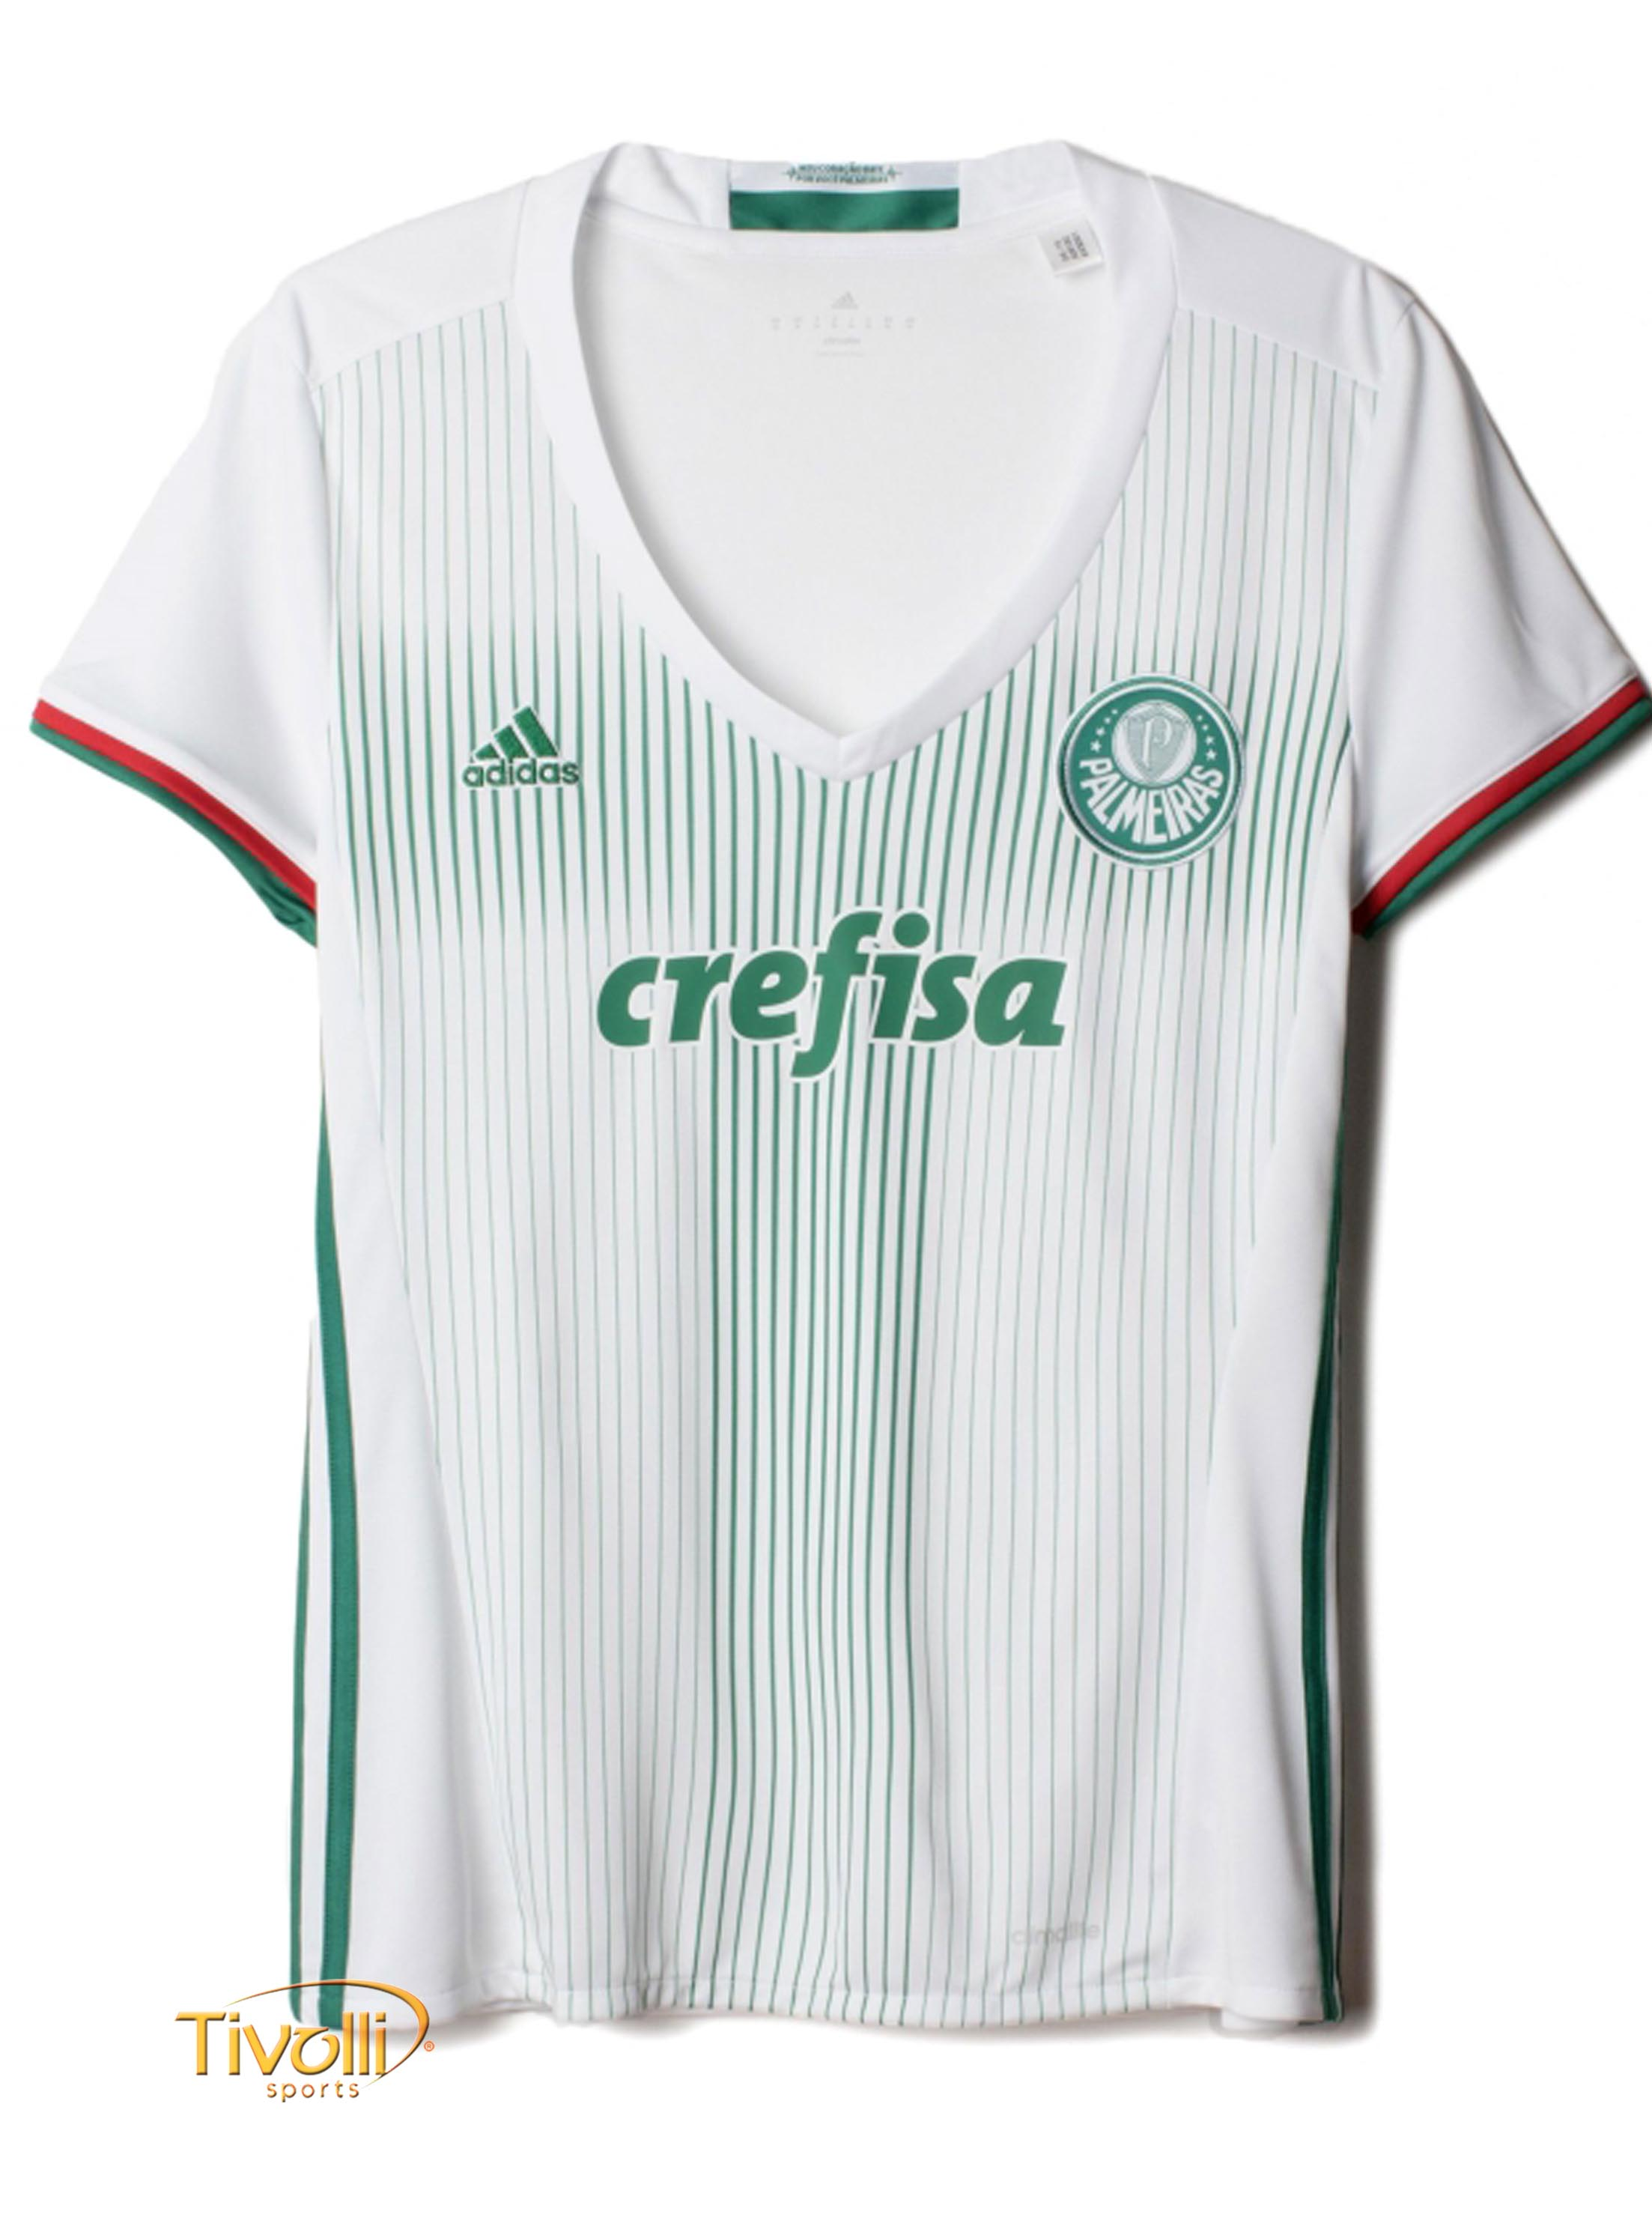 03a4951d32 Camisa Palmeiras II Away 2016 17 Adidas   Feminina - Mega Saldão